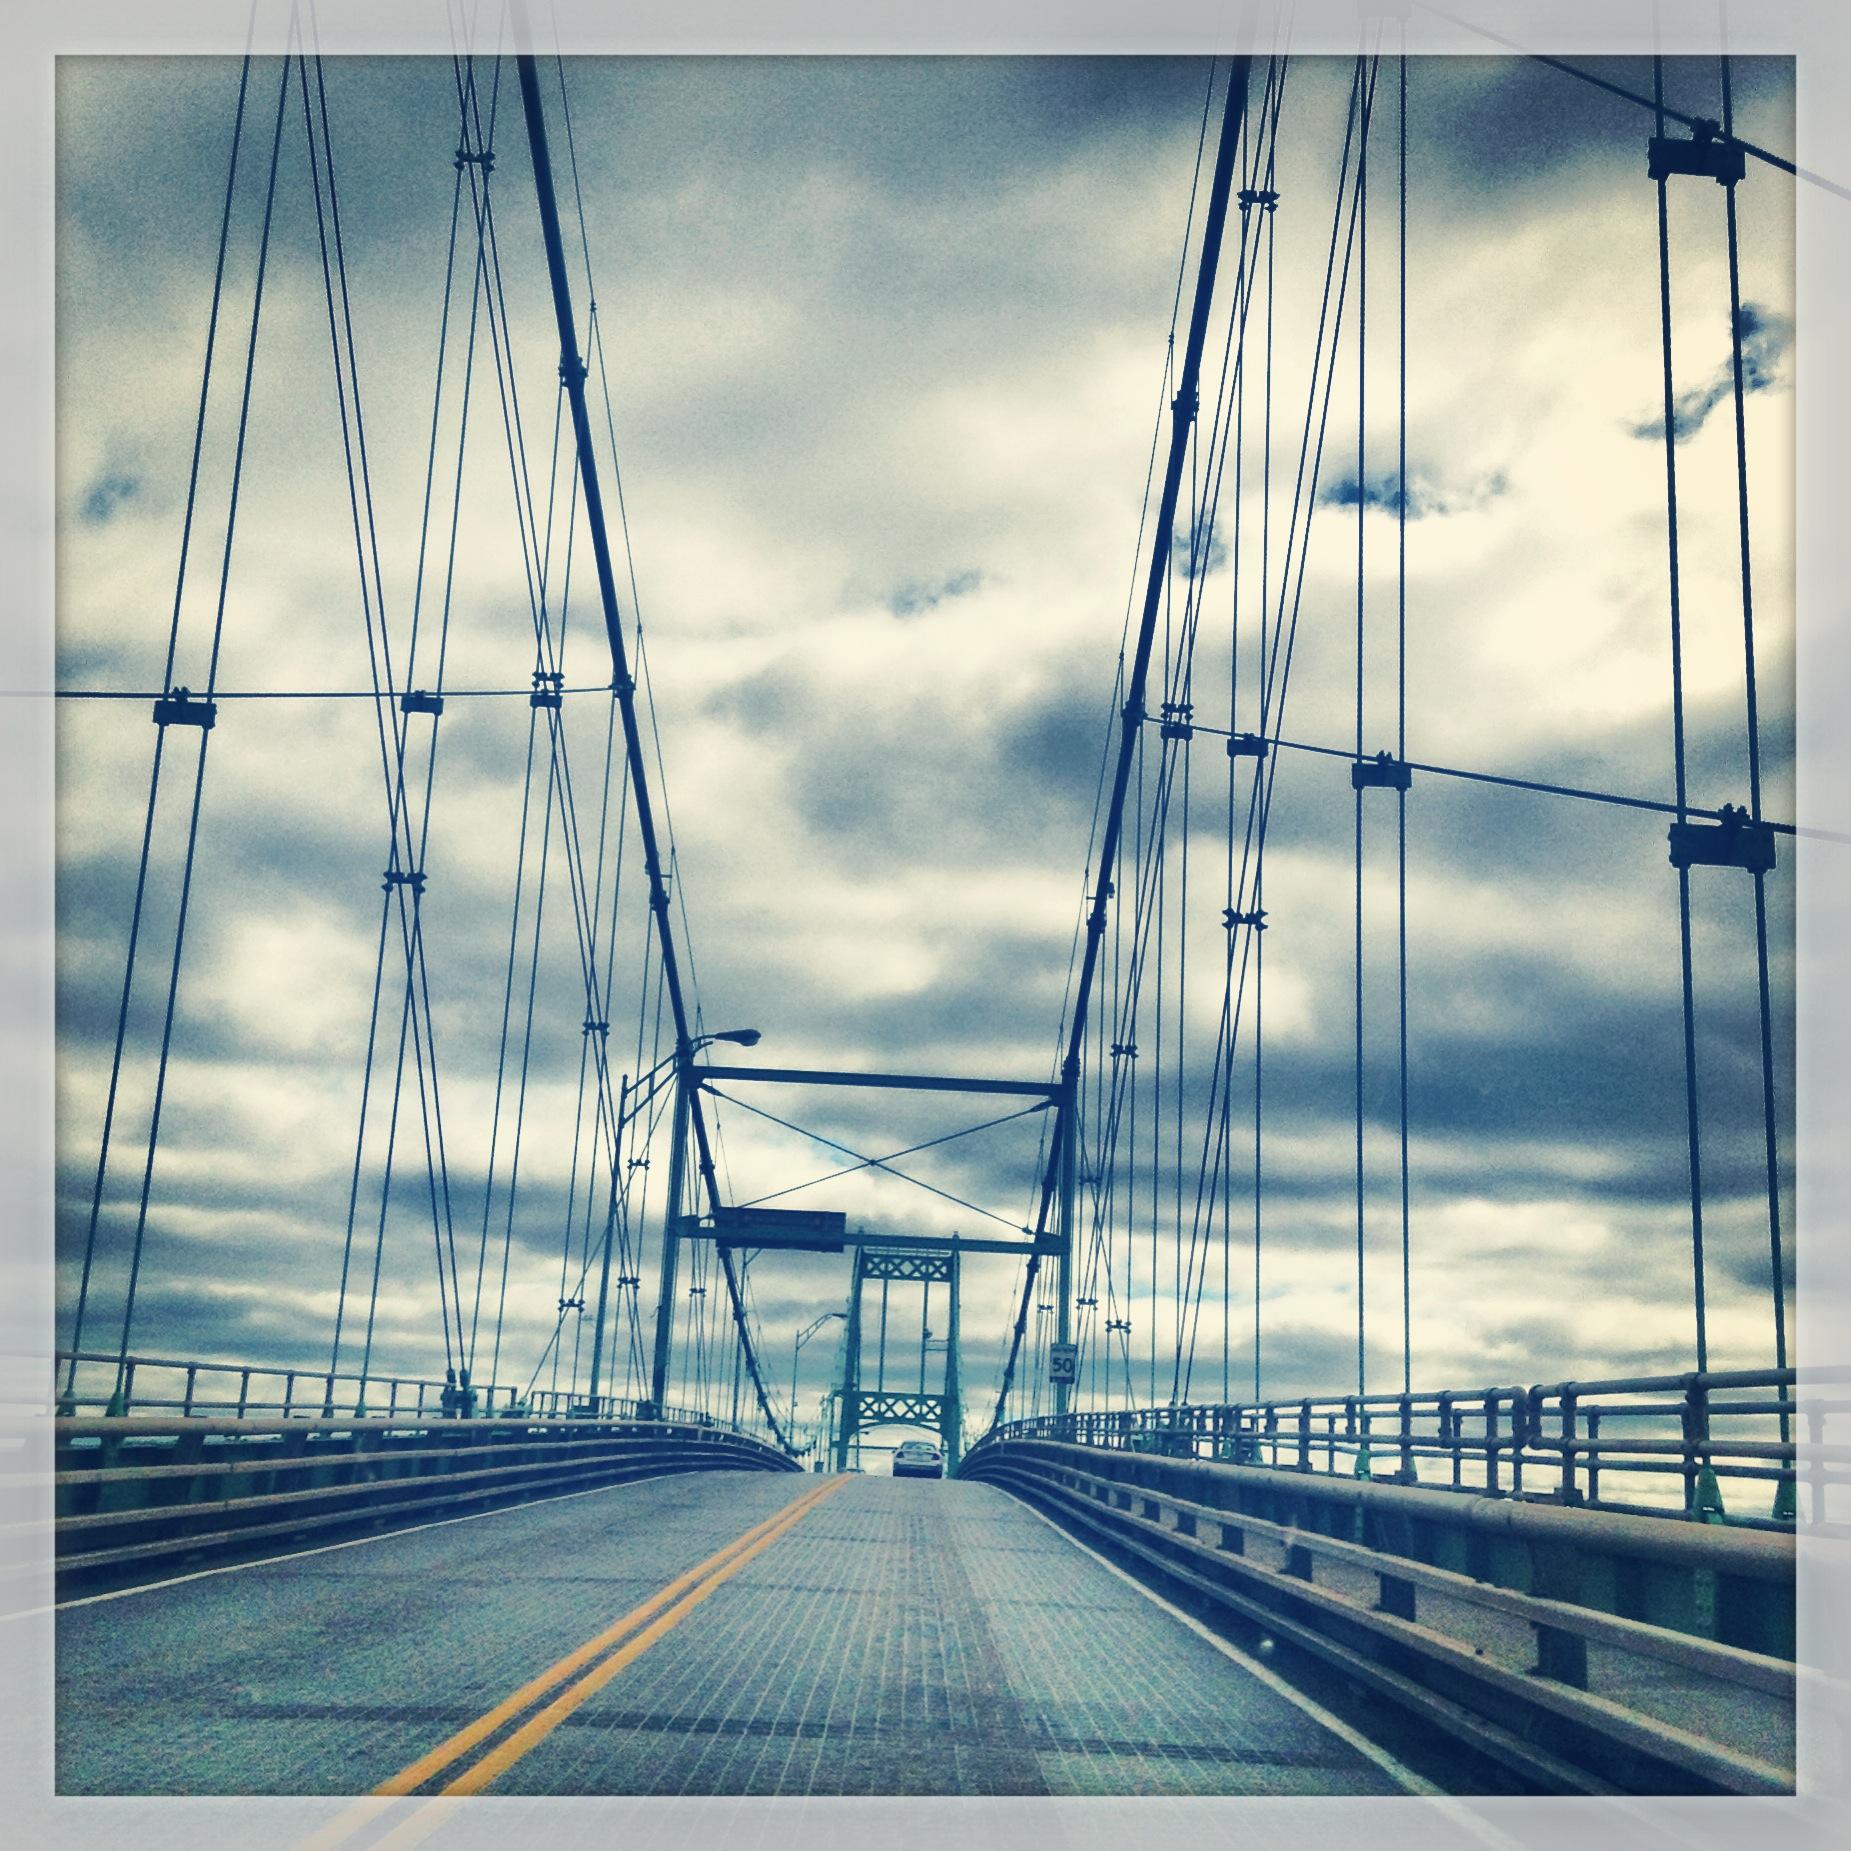 Bridge to the U.S.A.